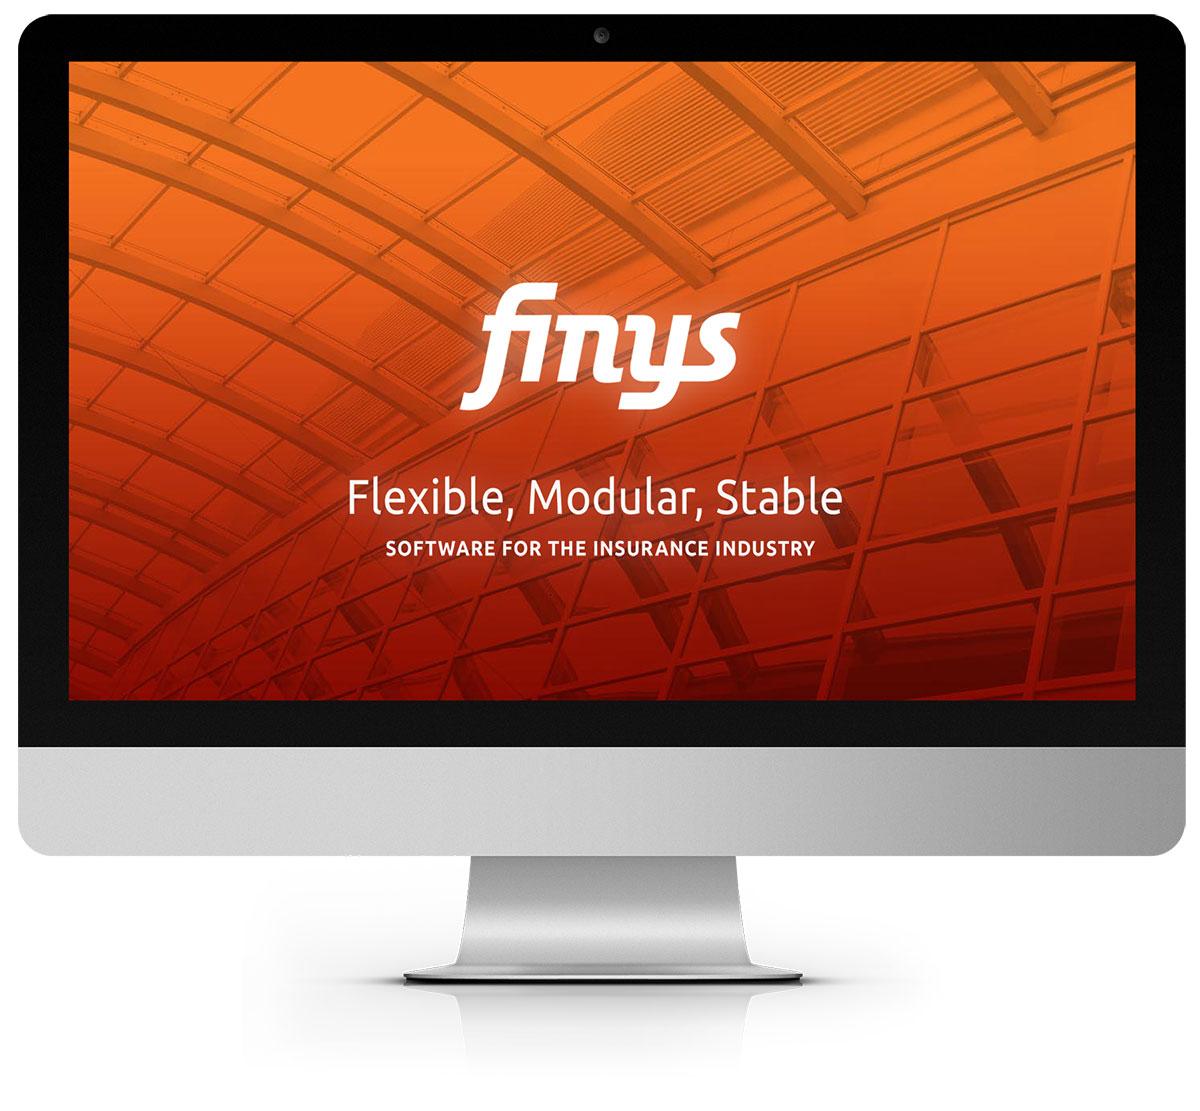 Finys_iMac.jpg